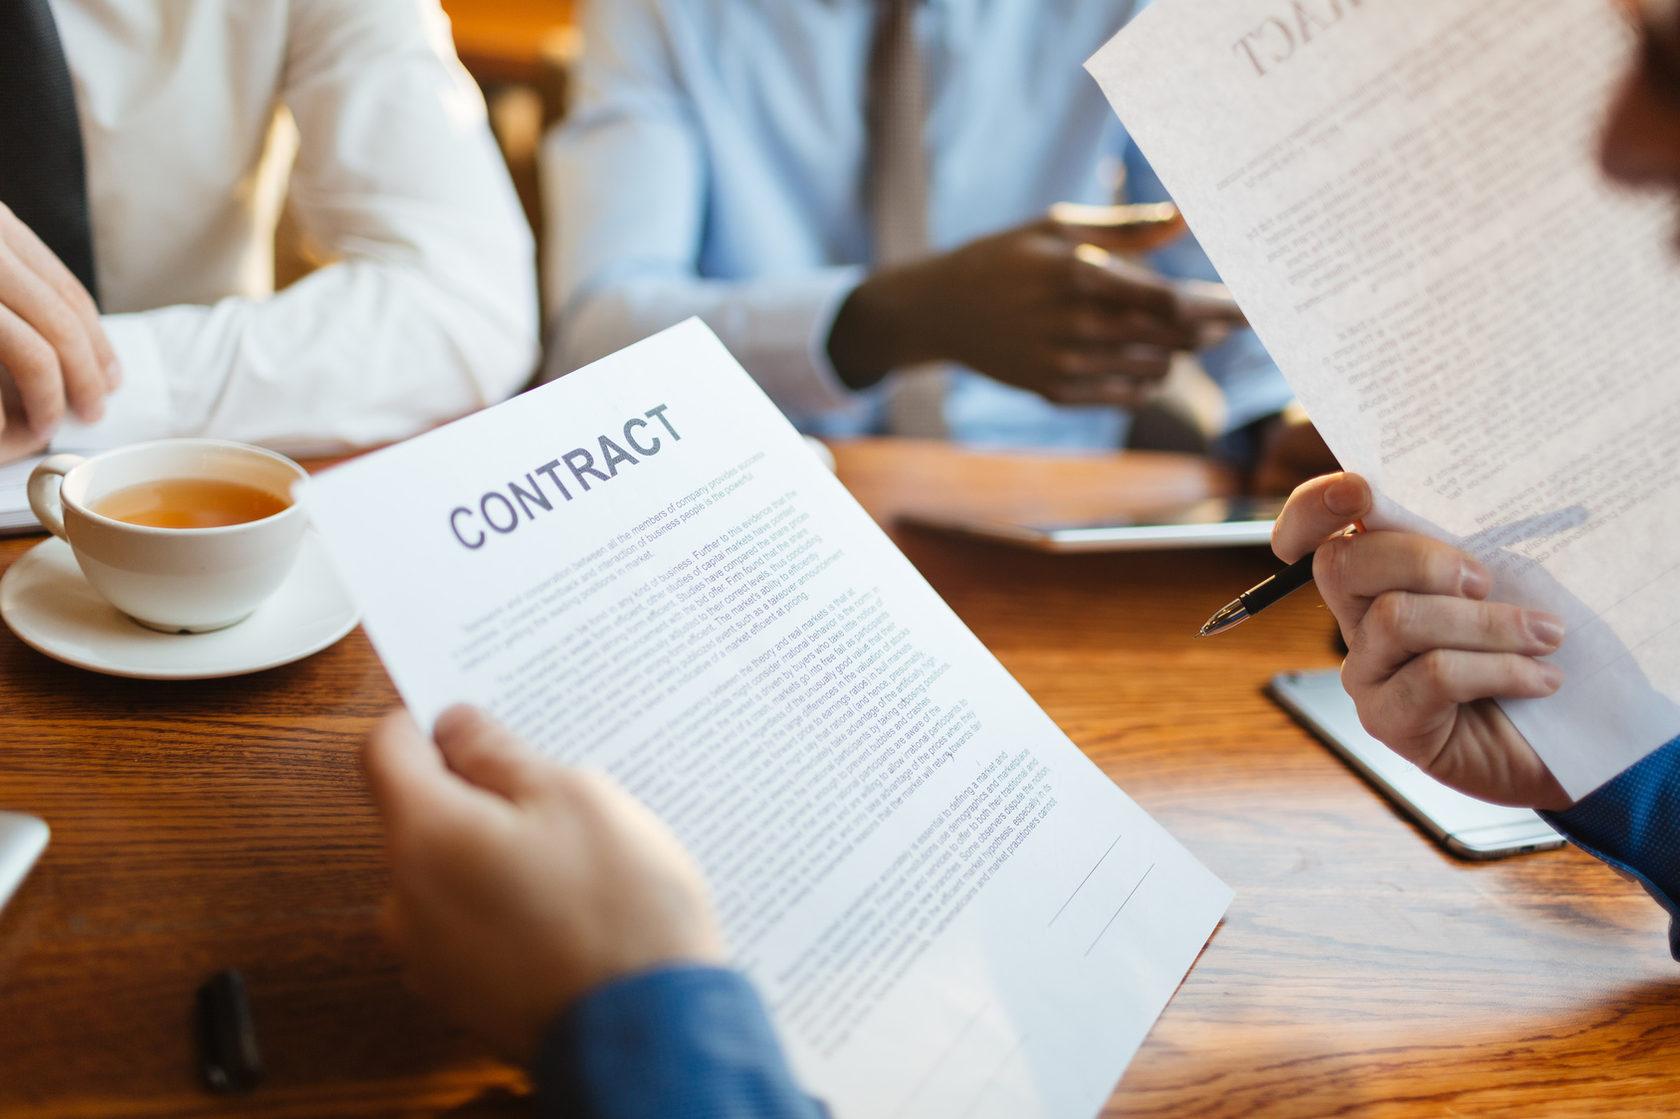 Как заключить e-contract? Советы юриста. Адвокат Запорожье. Линия права